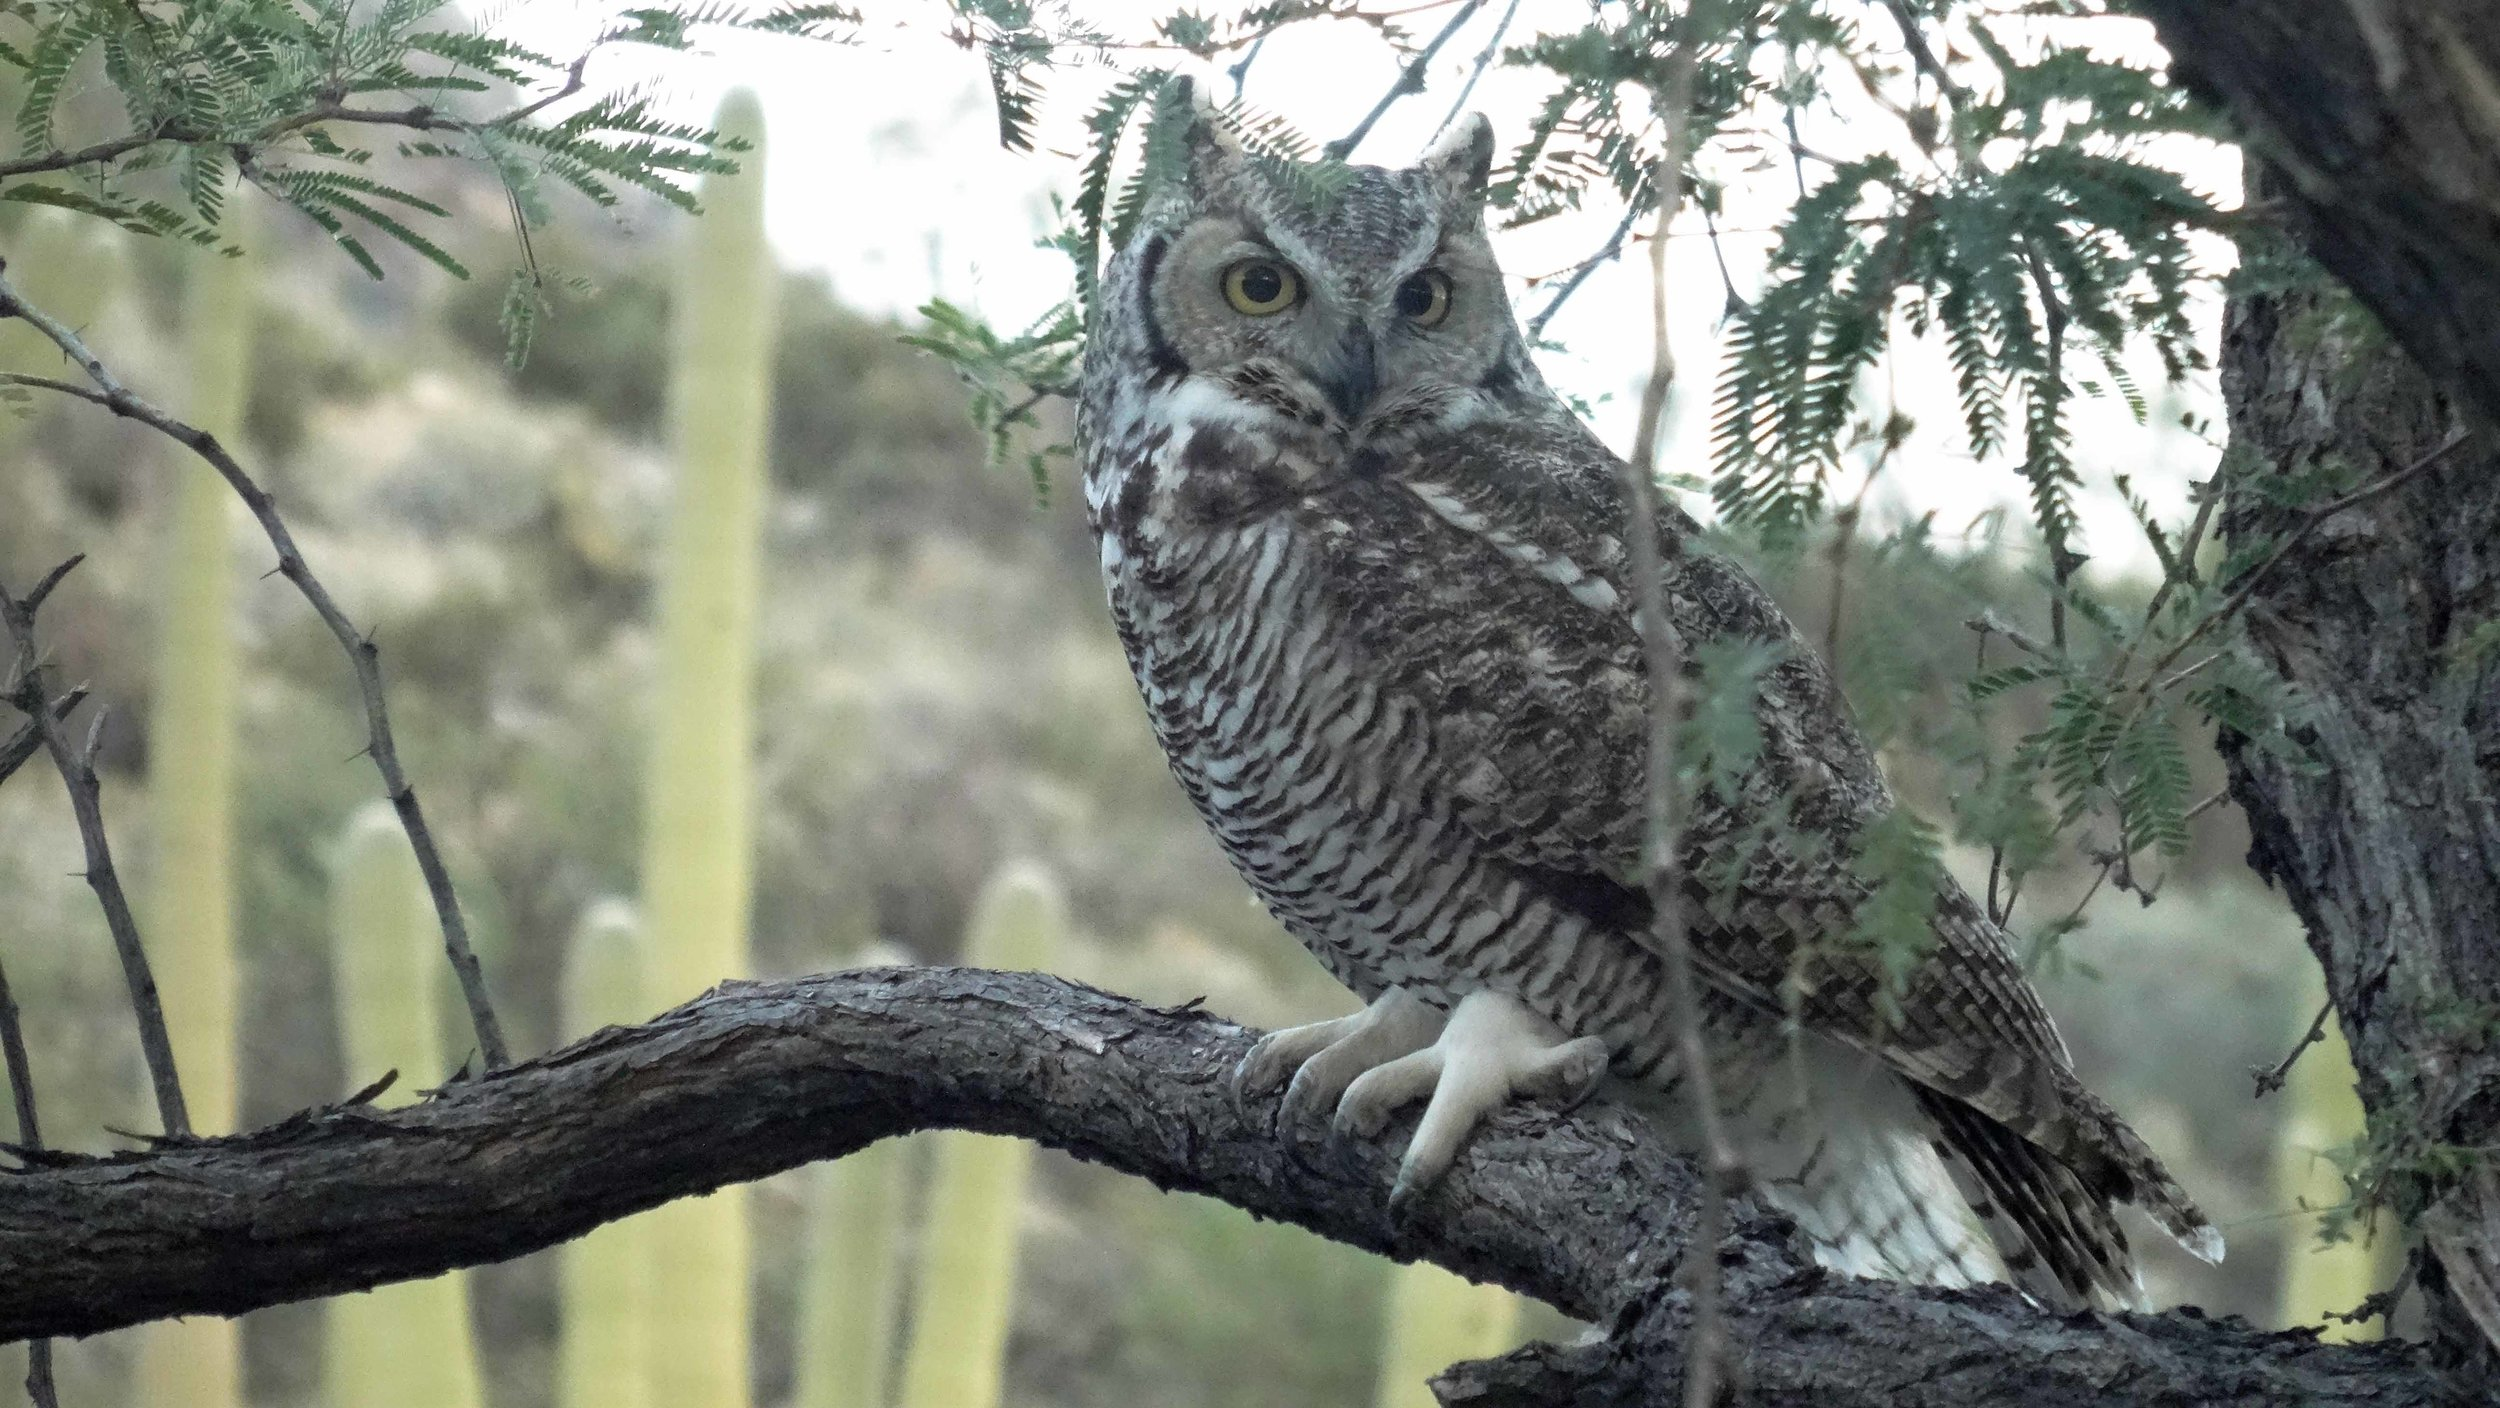 Great Horned Owl on Tree in Back Yard.jpg